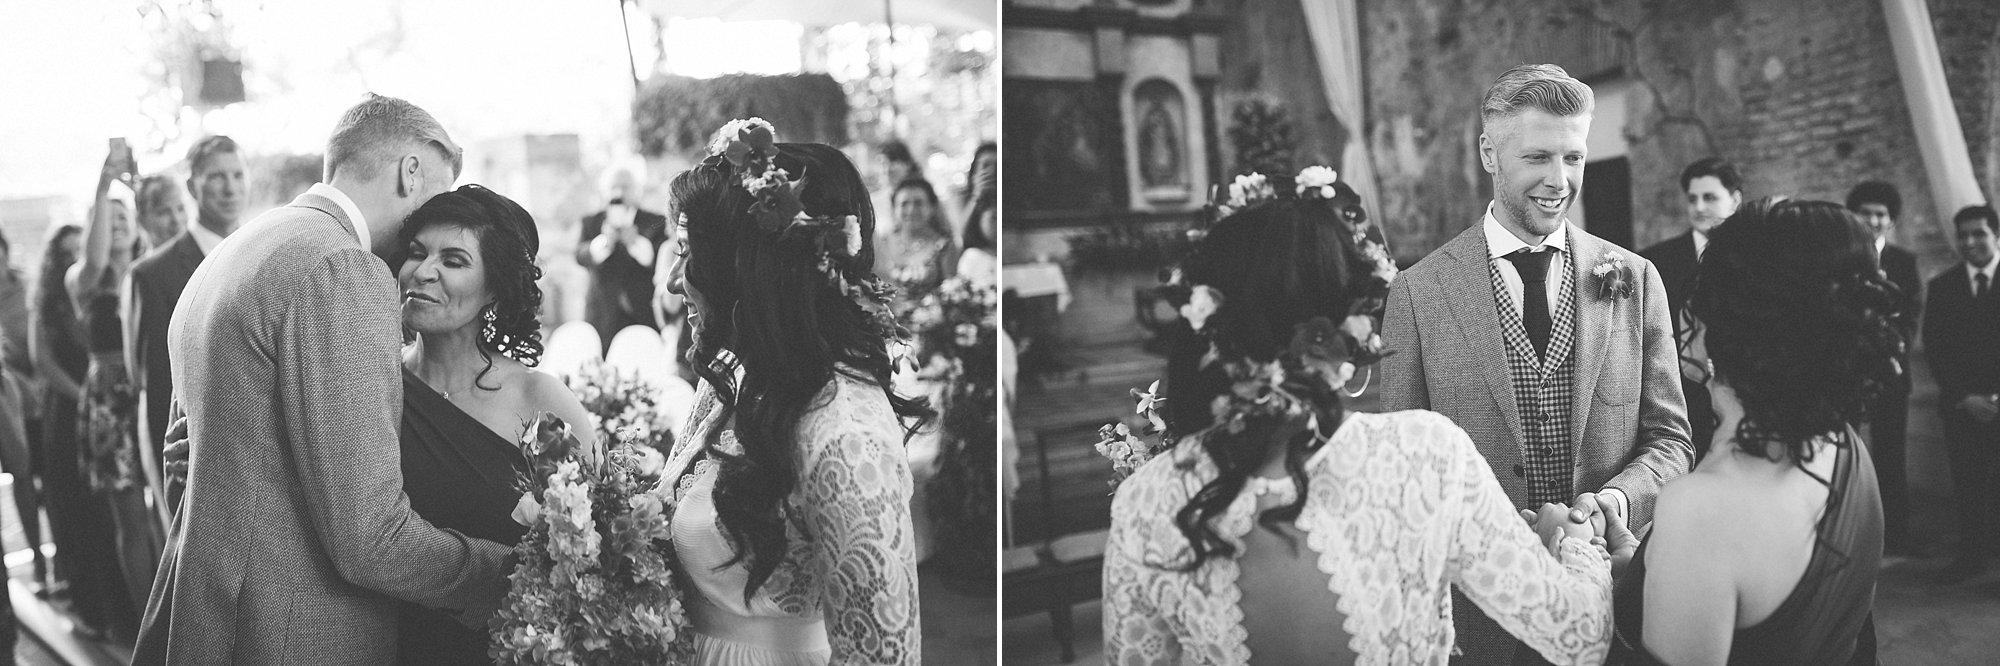 alex-yazmin-wedding-photographer-antigua-guatemala-068